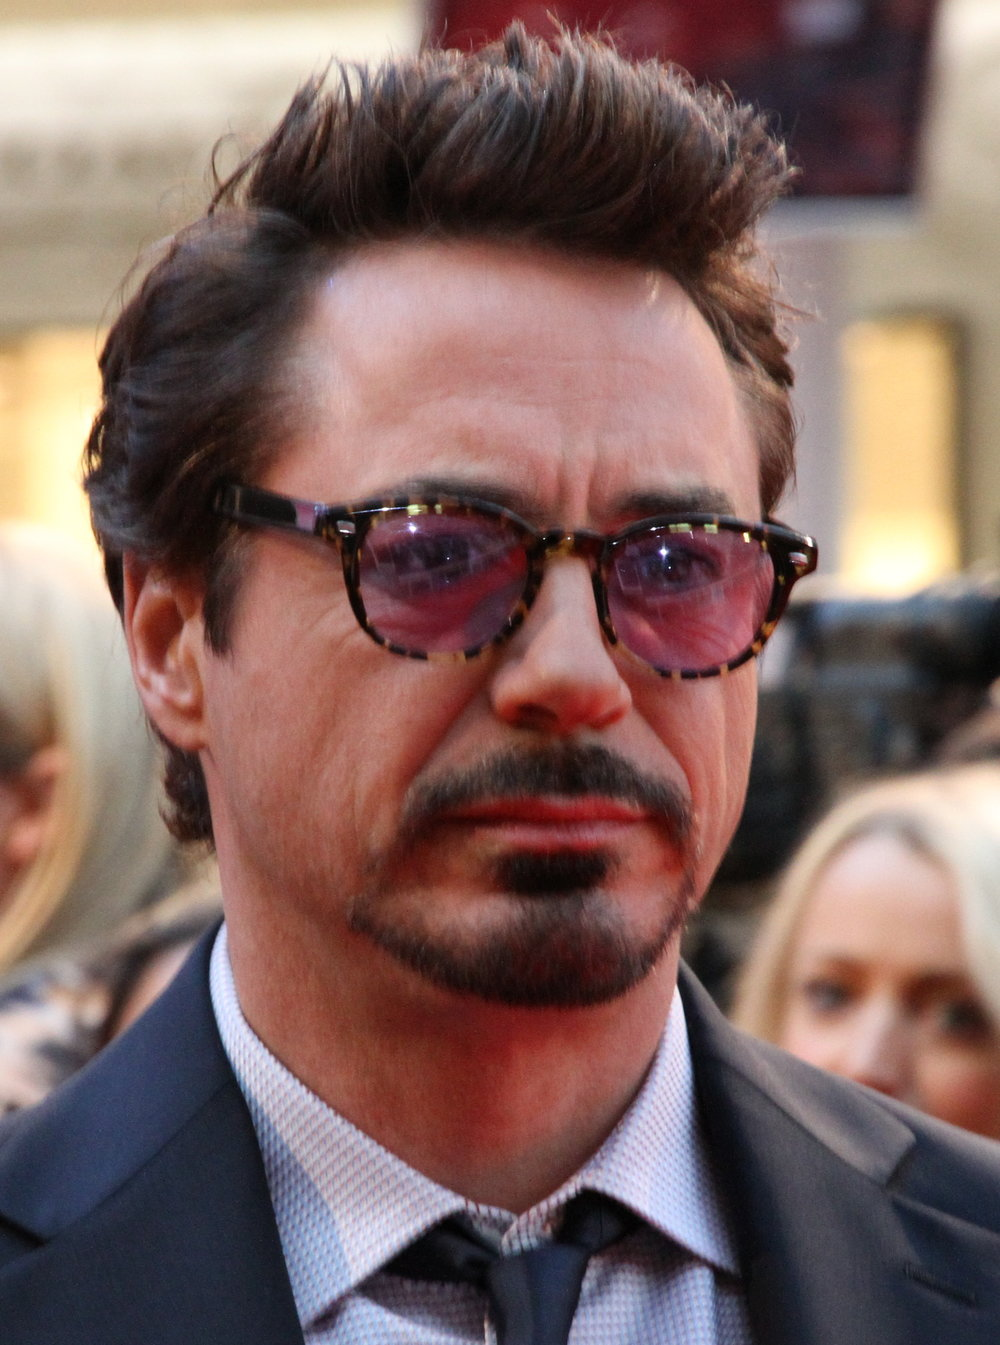 Robert_Downey,_Jr._2012.jpg